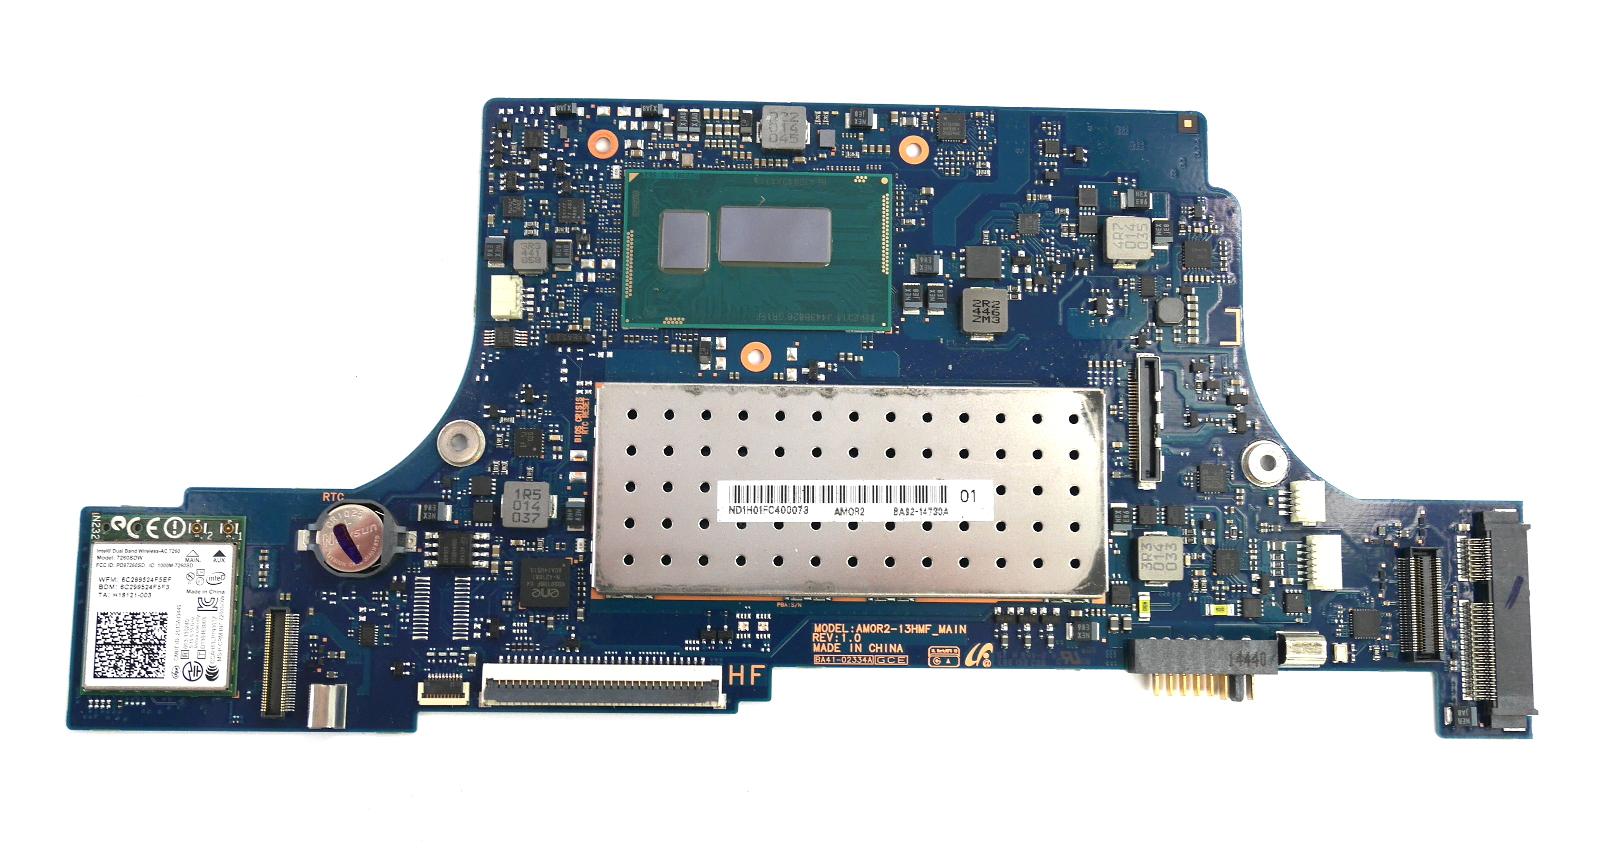 Samsung 900X BA92-14730 Laptop Motherboard with BGA Intel Core i5-4210U CPU